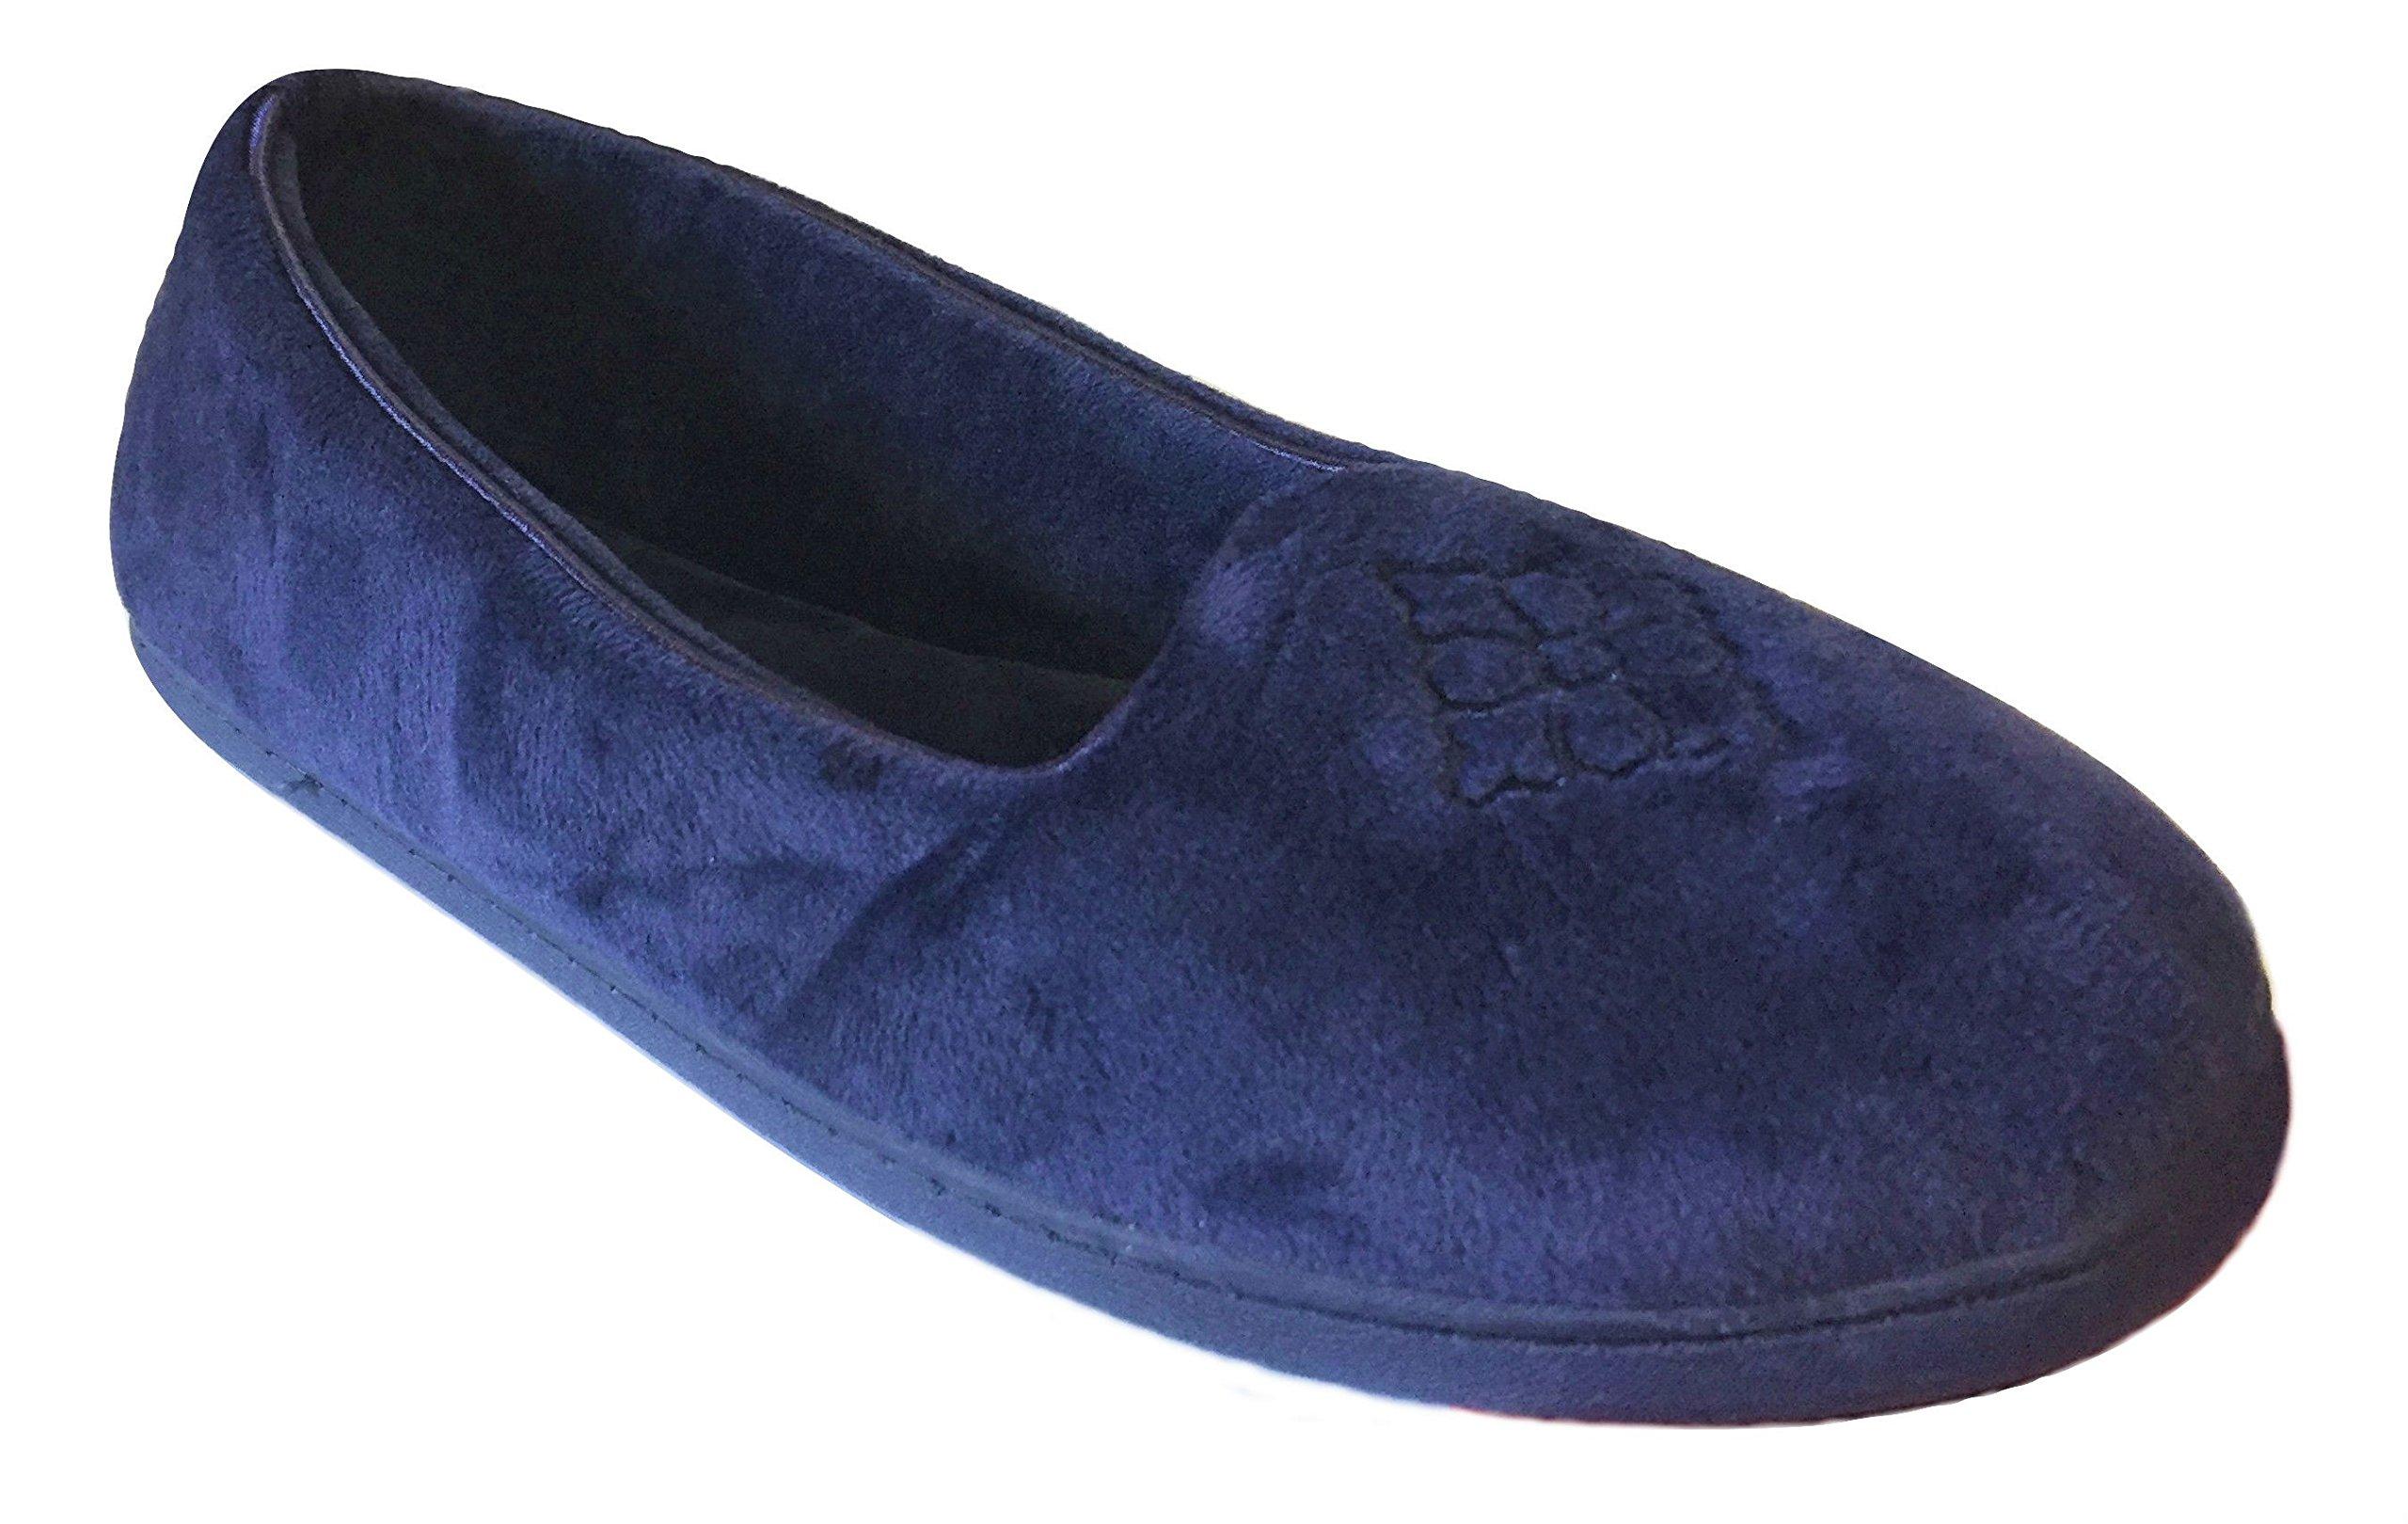 Dearfoams Women's Velour Closed Back Slippers, Large/9-10 B(M) US, Peacoat